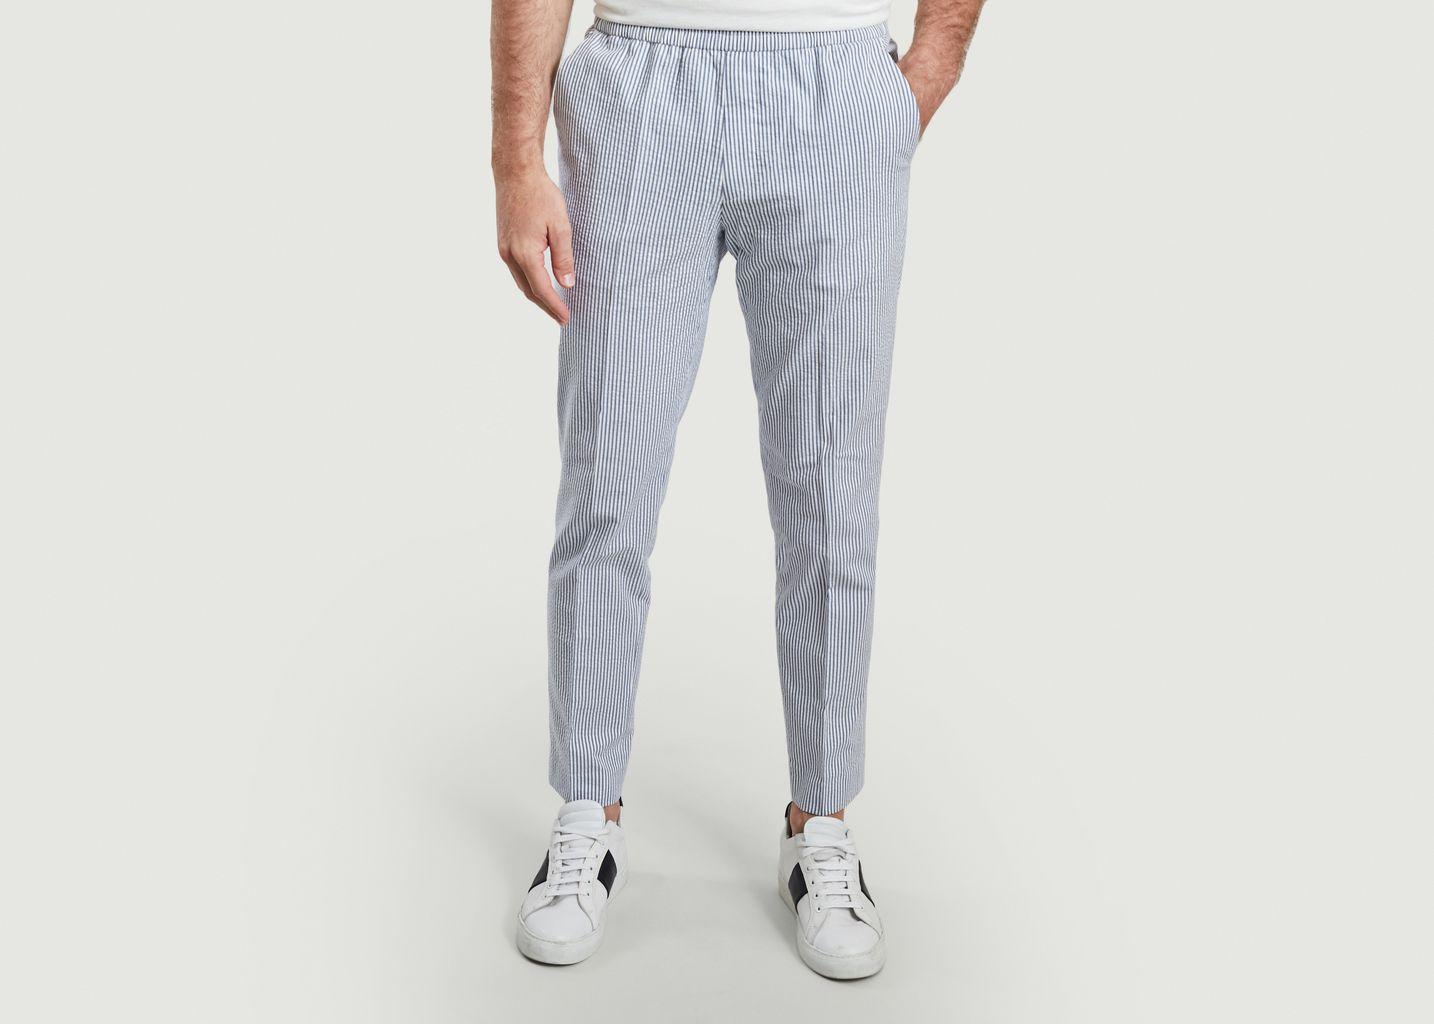 Pantalon Paolo imprimé rayures - Harmony